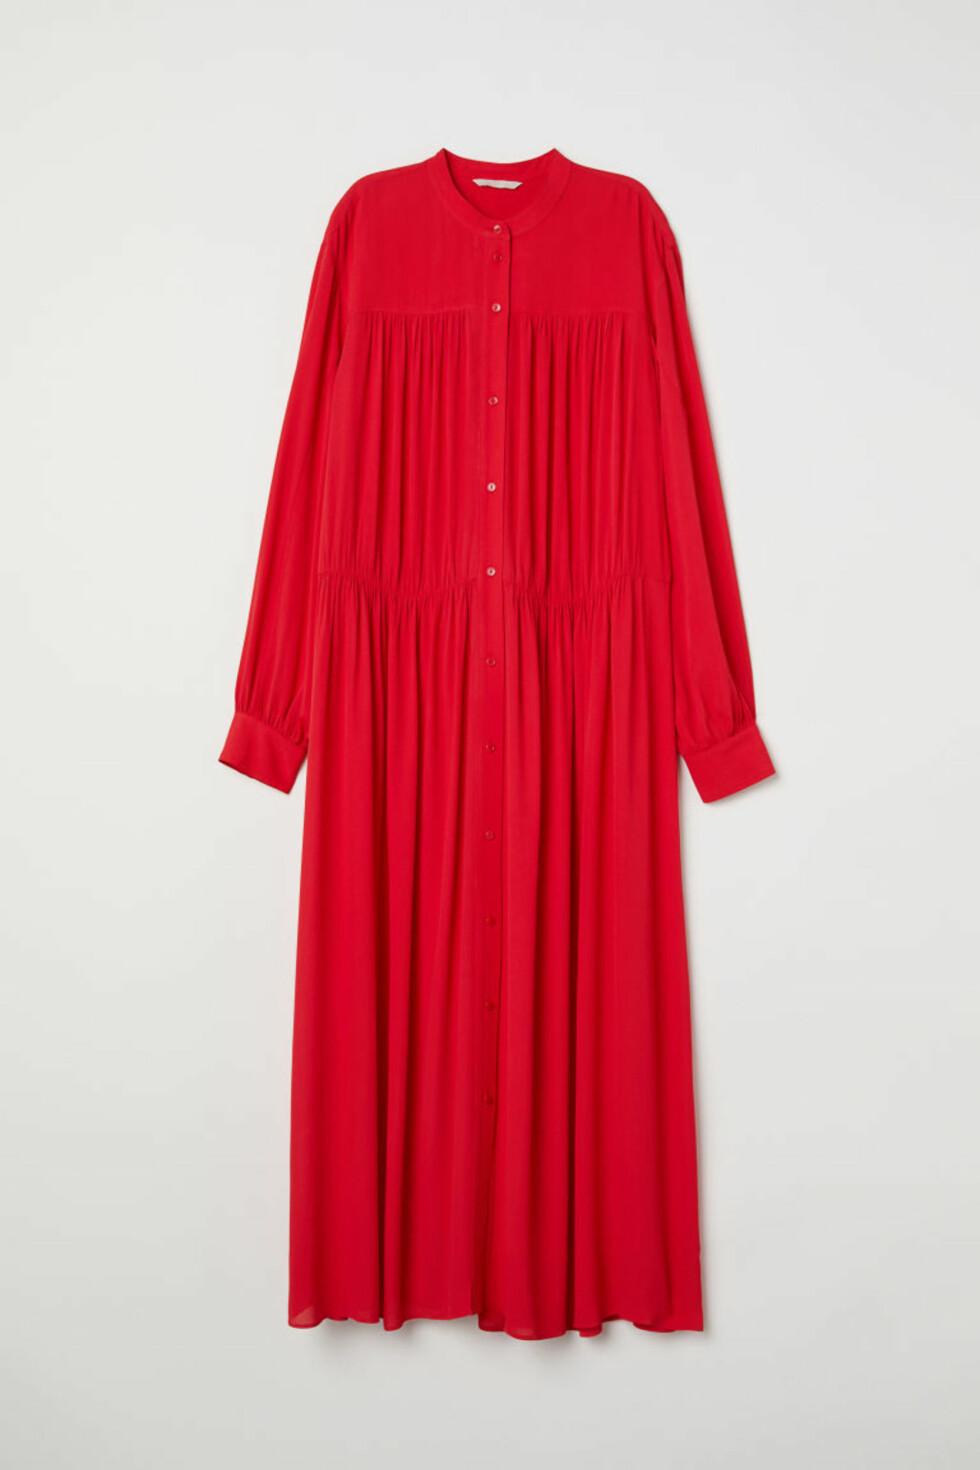 Kjole fra H&M |500,-| http://www2.hm.com/no_no/productpage.0614543008.html